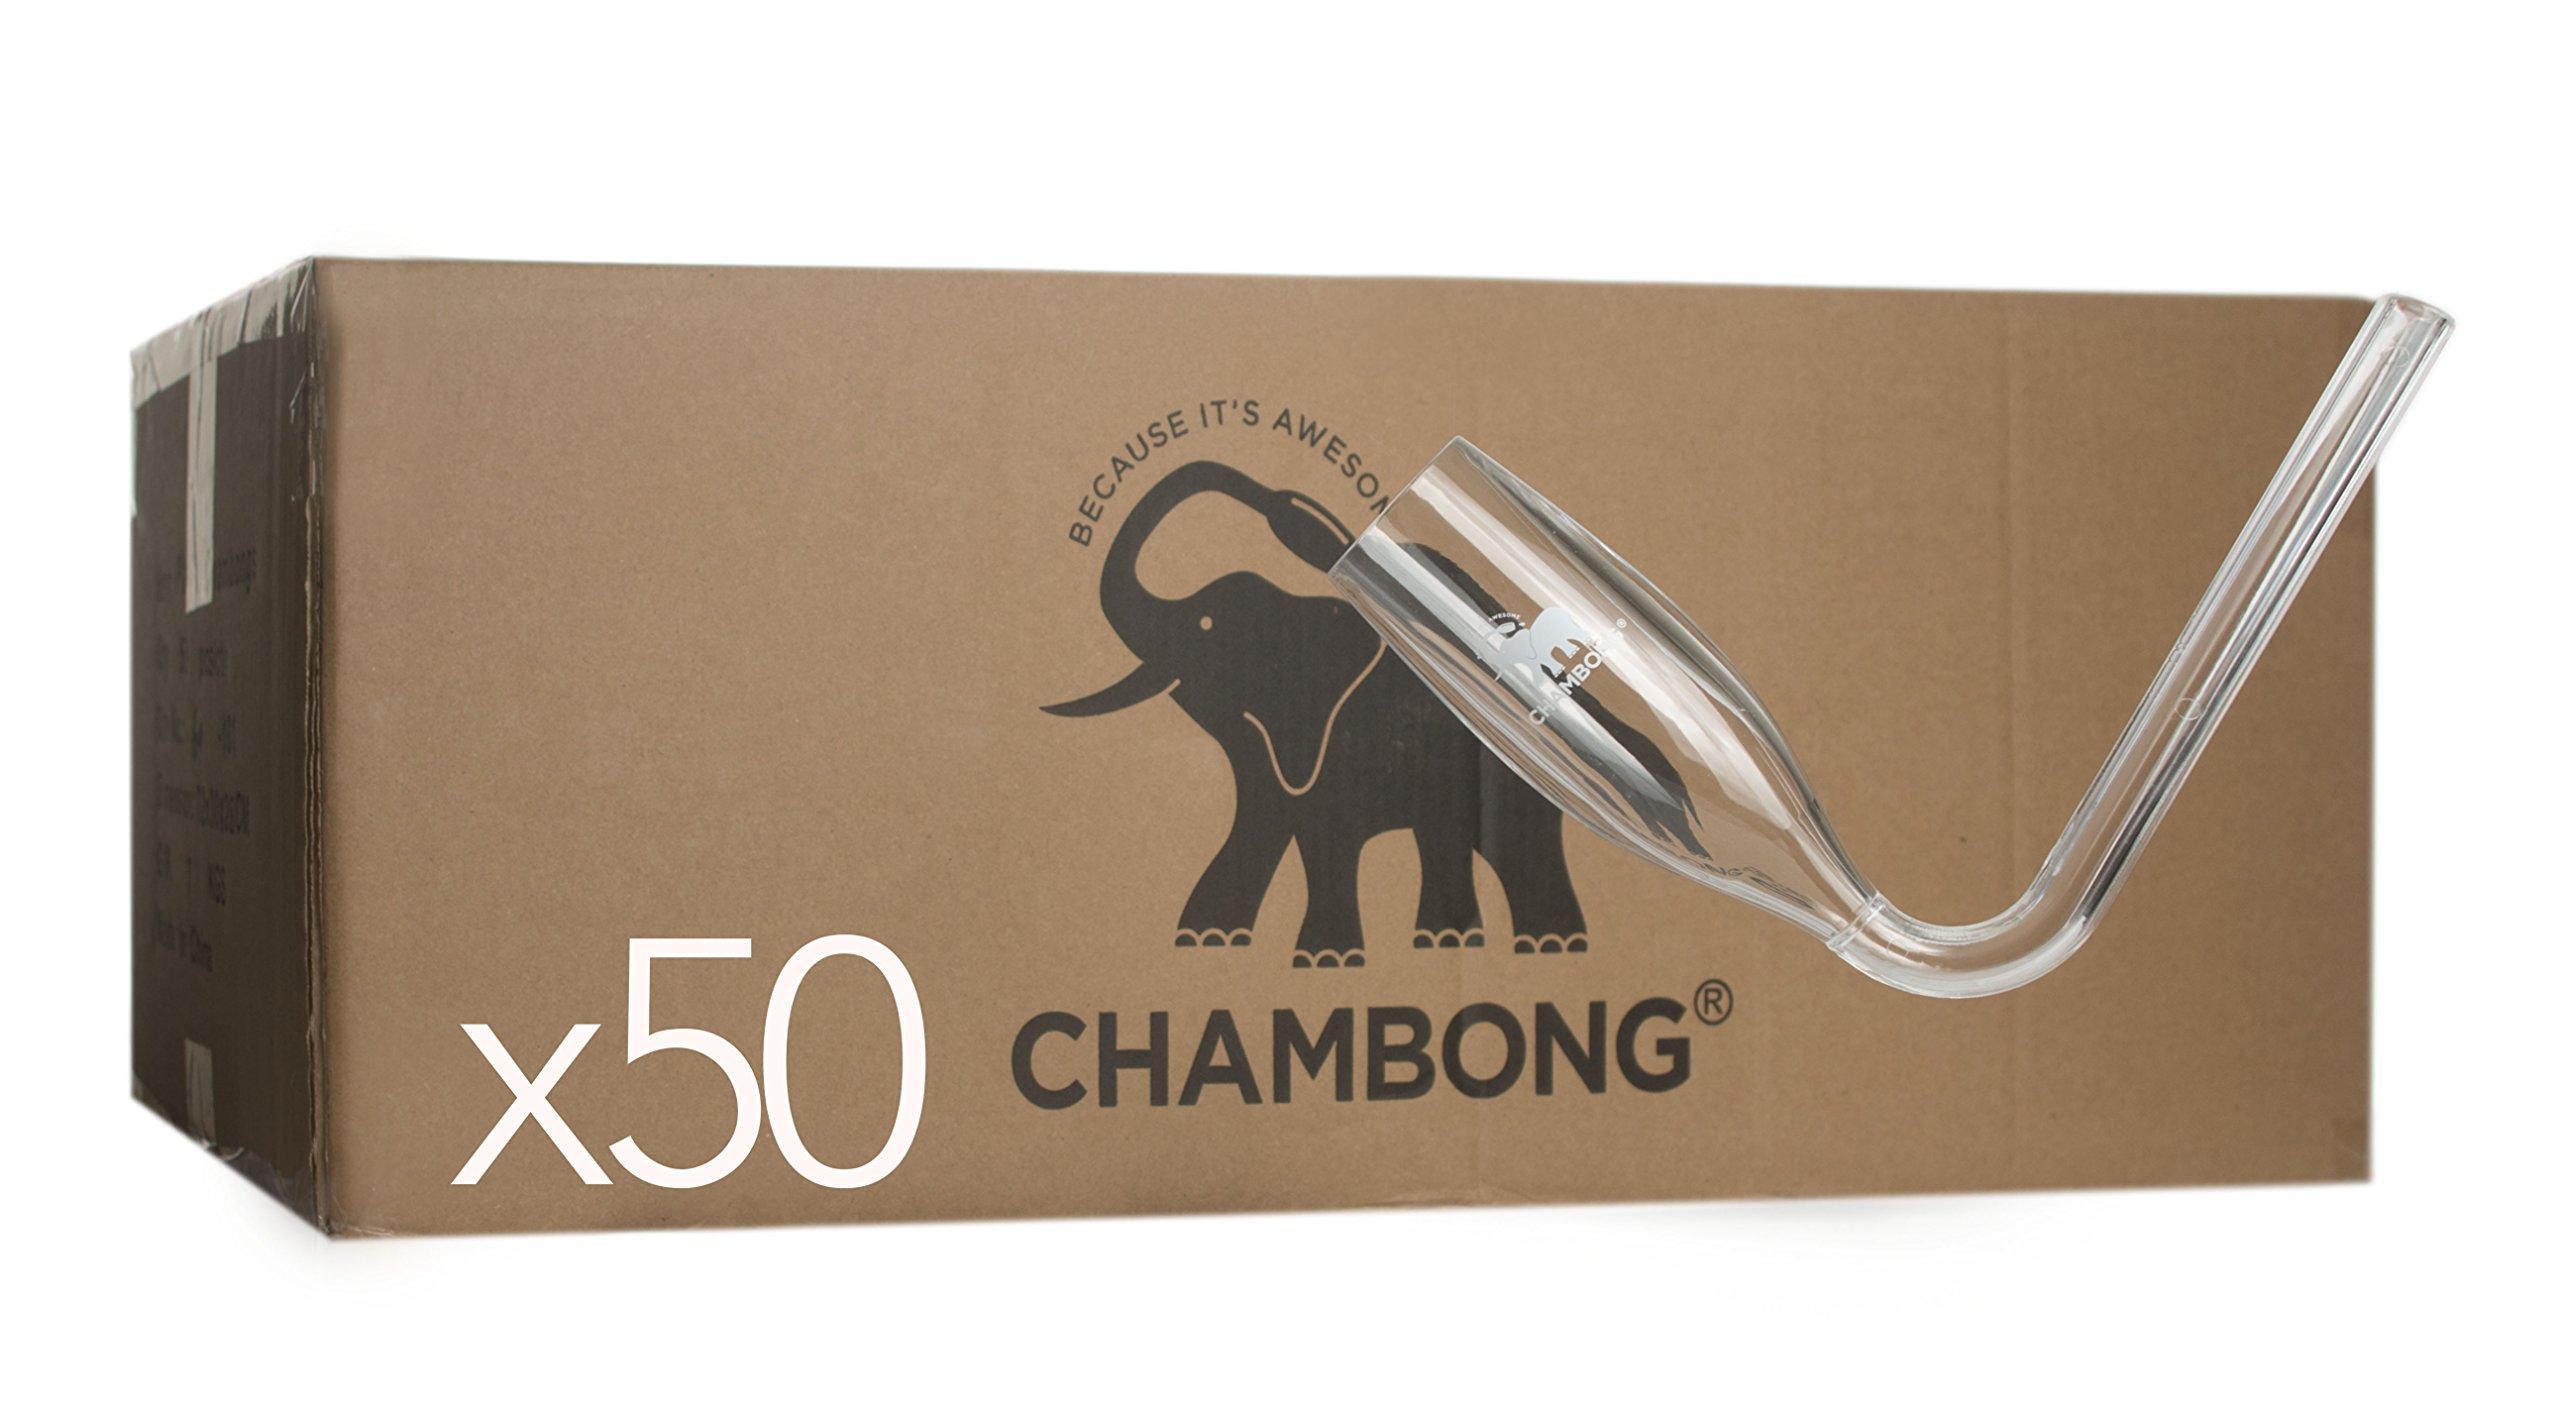 Chambong (Plastic) Bulk 50 pieces - Acrylic Chambongs: Case of 50